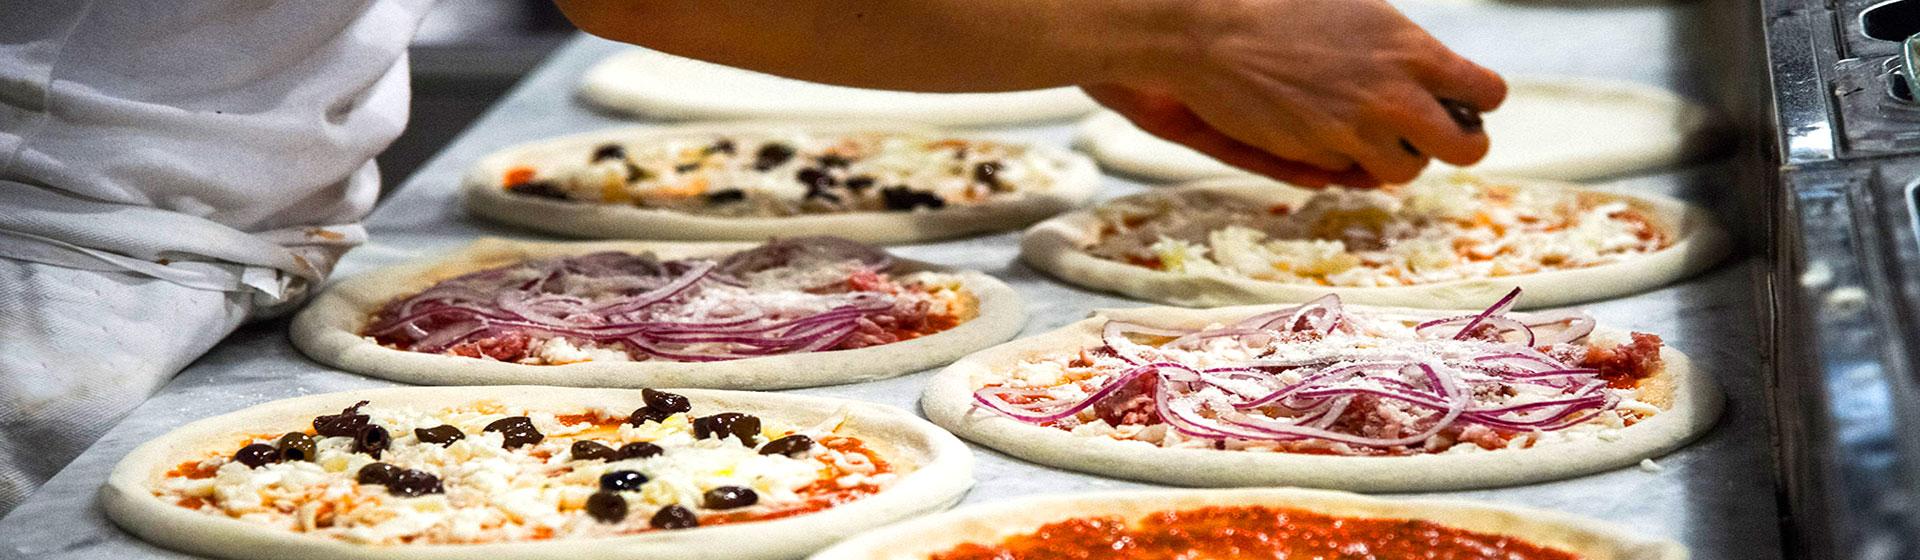 slide_pizza_01_pizzeria-restaurante_erik_lanzarote